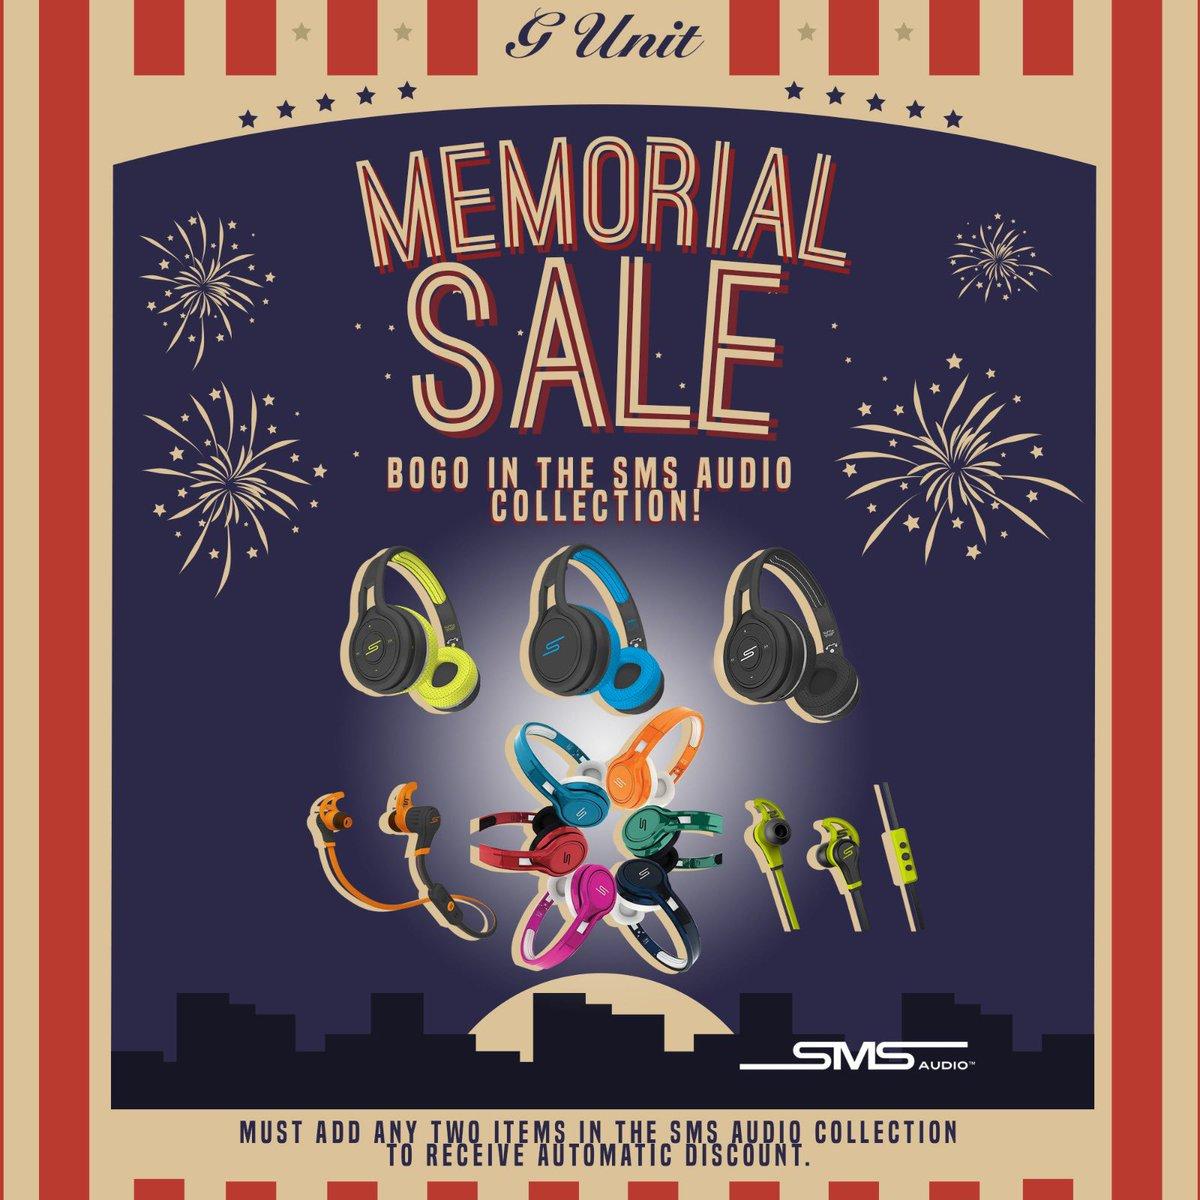 Buy 1, Get 1 Free ! Memorial Sale Ends Tonight! - https://t.co/ZXDHL77Cqa https://t.co/dC6TDGFgjo